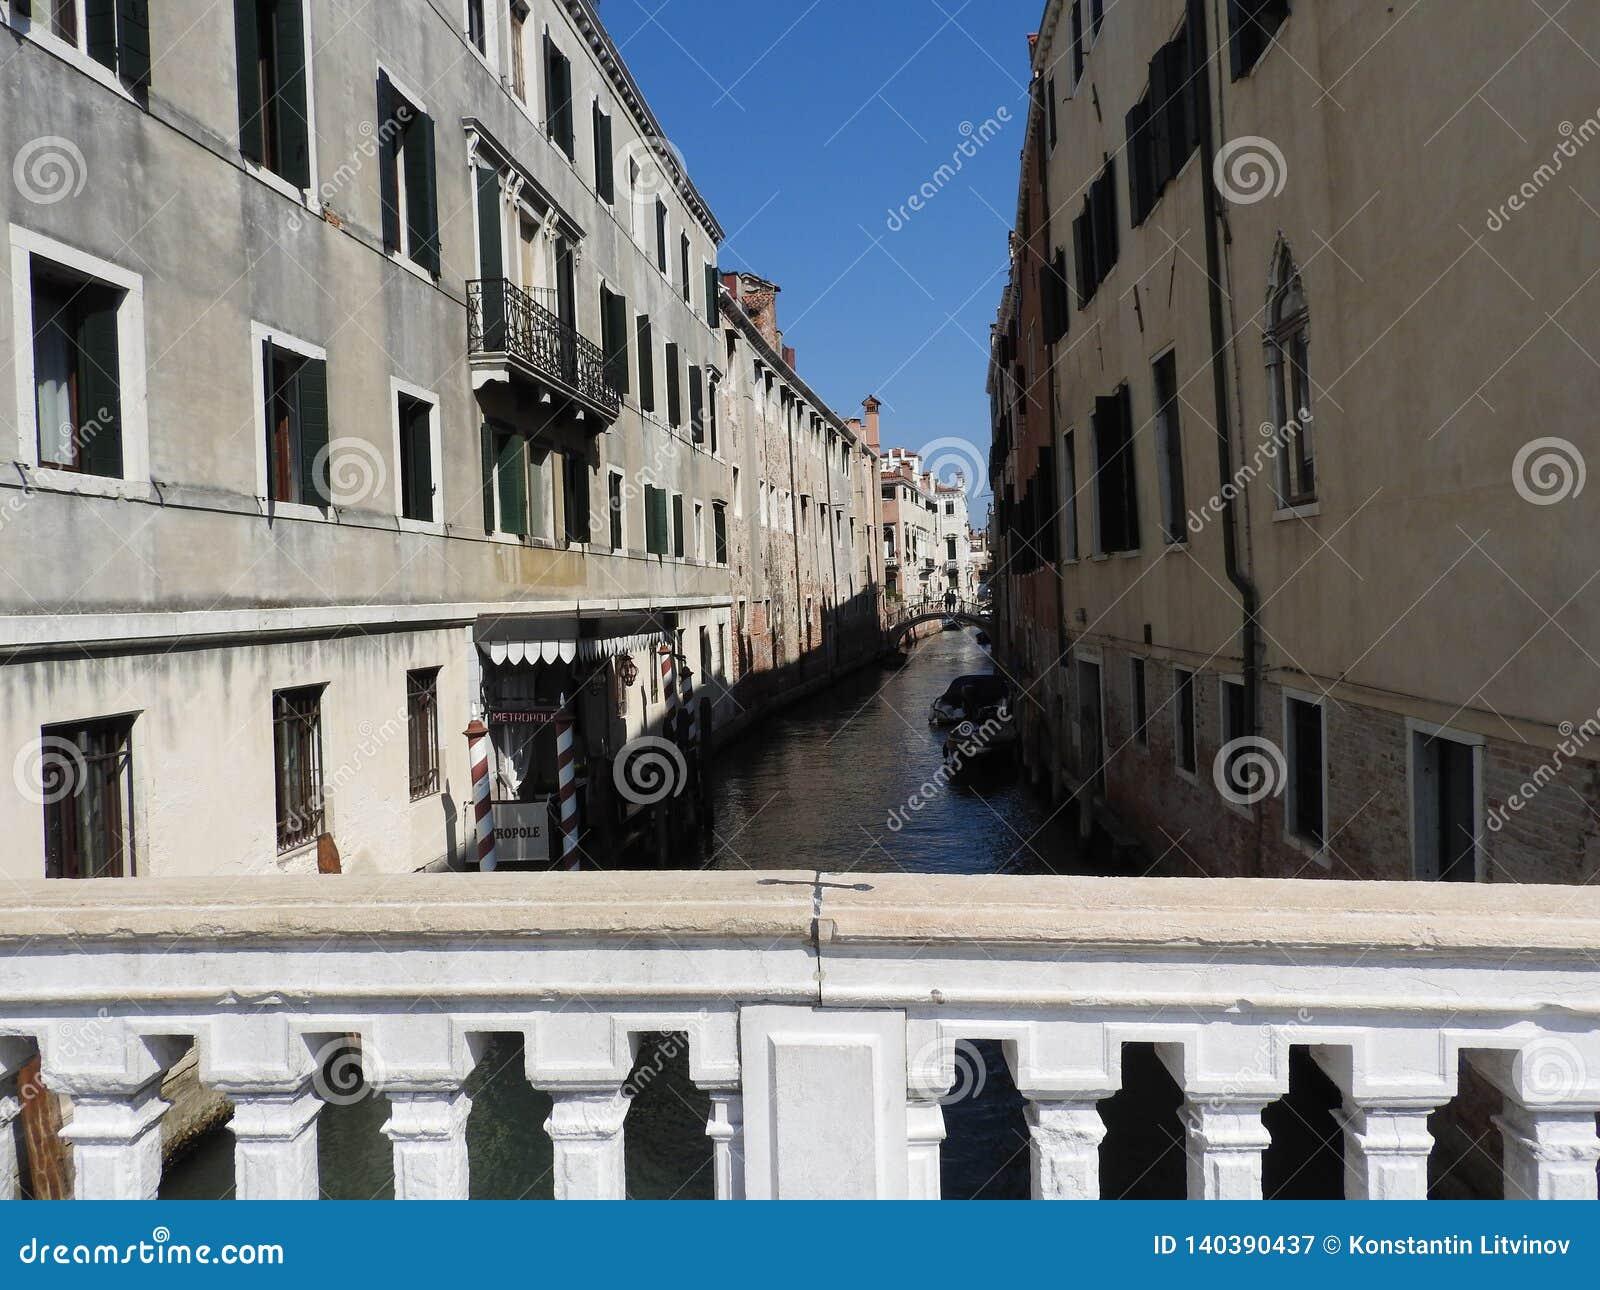 Uitstekende architectuur van Venetië, Italië, steenvoorgevels en ontwerpelementen, een reis aan Europa